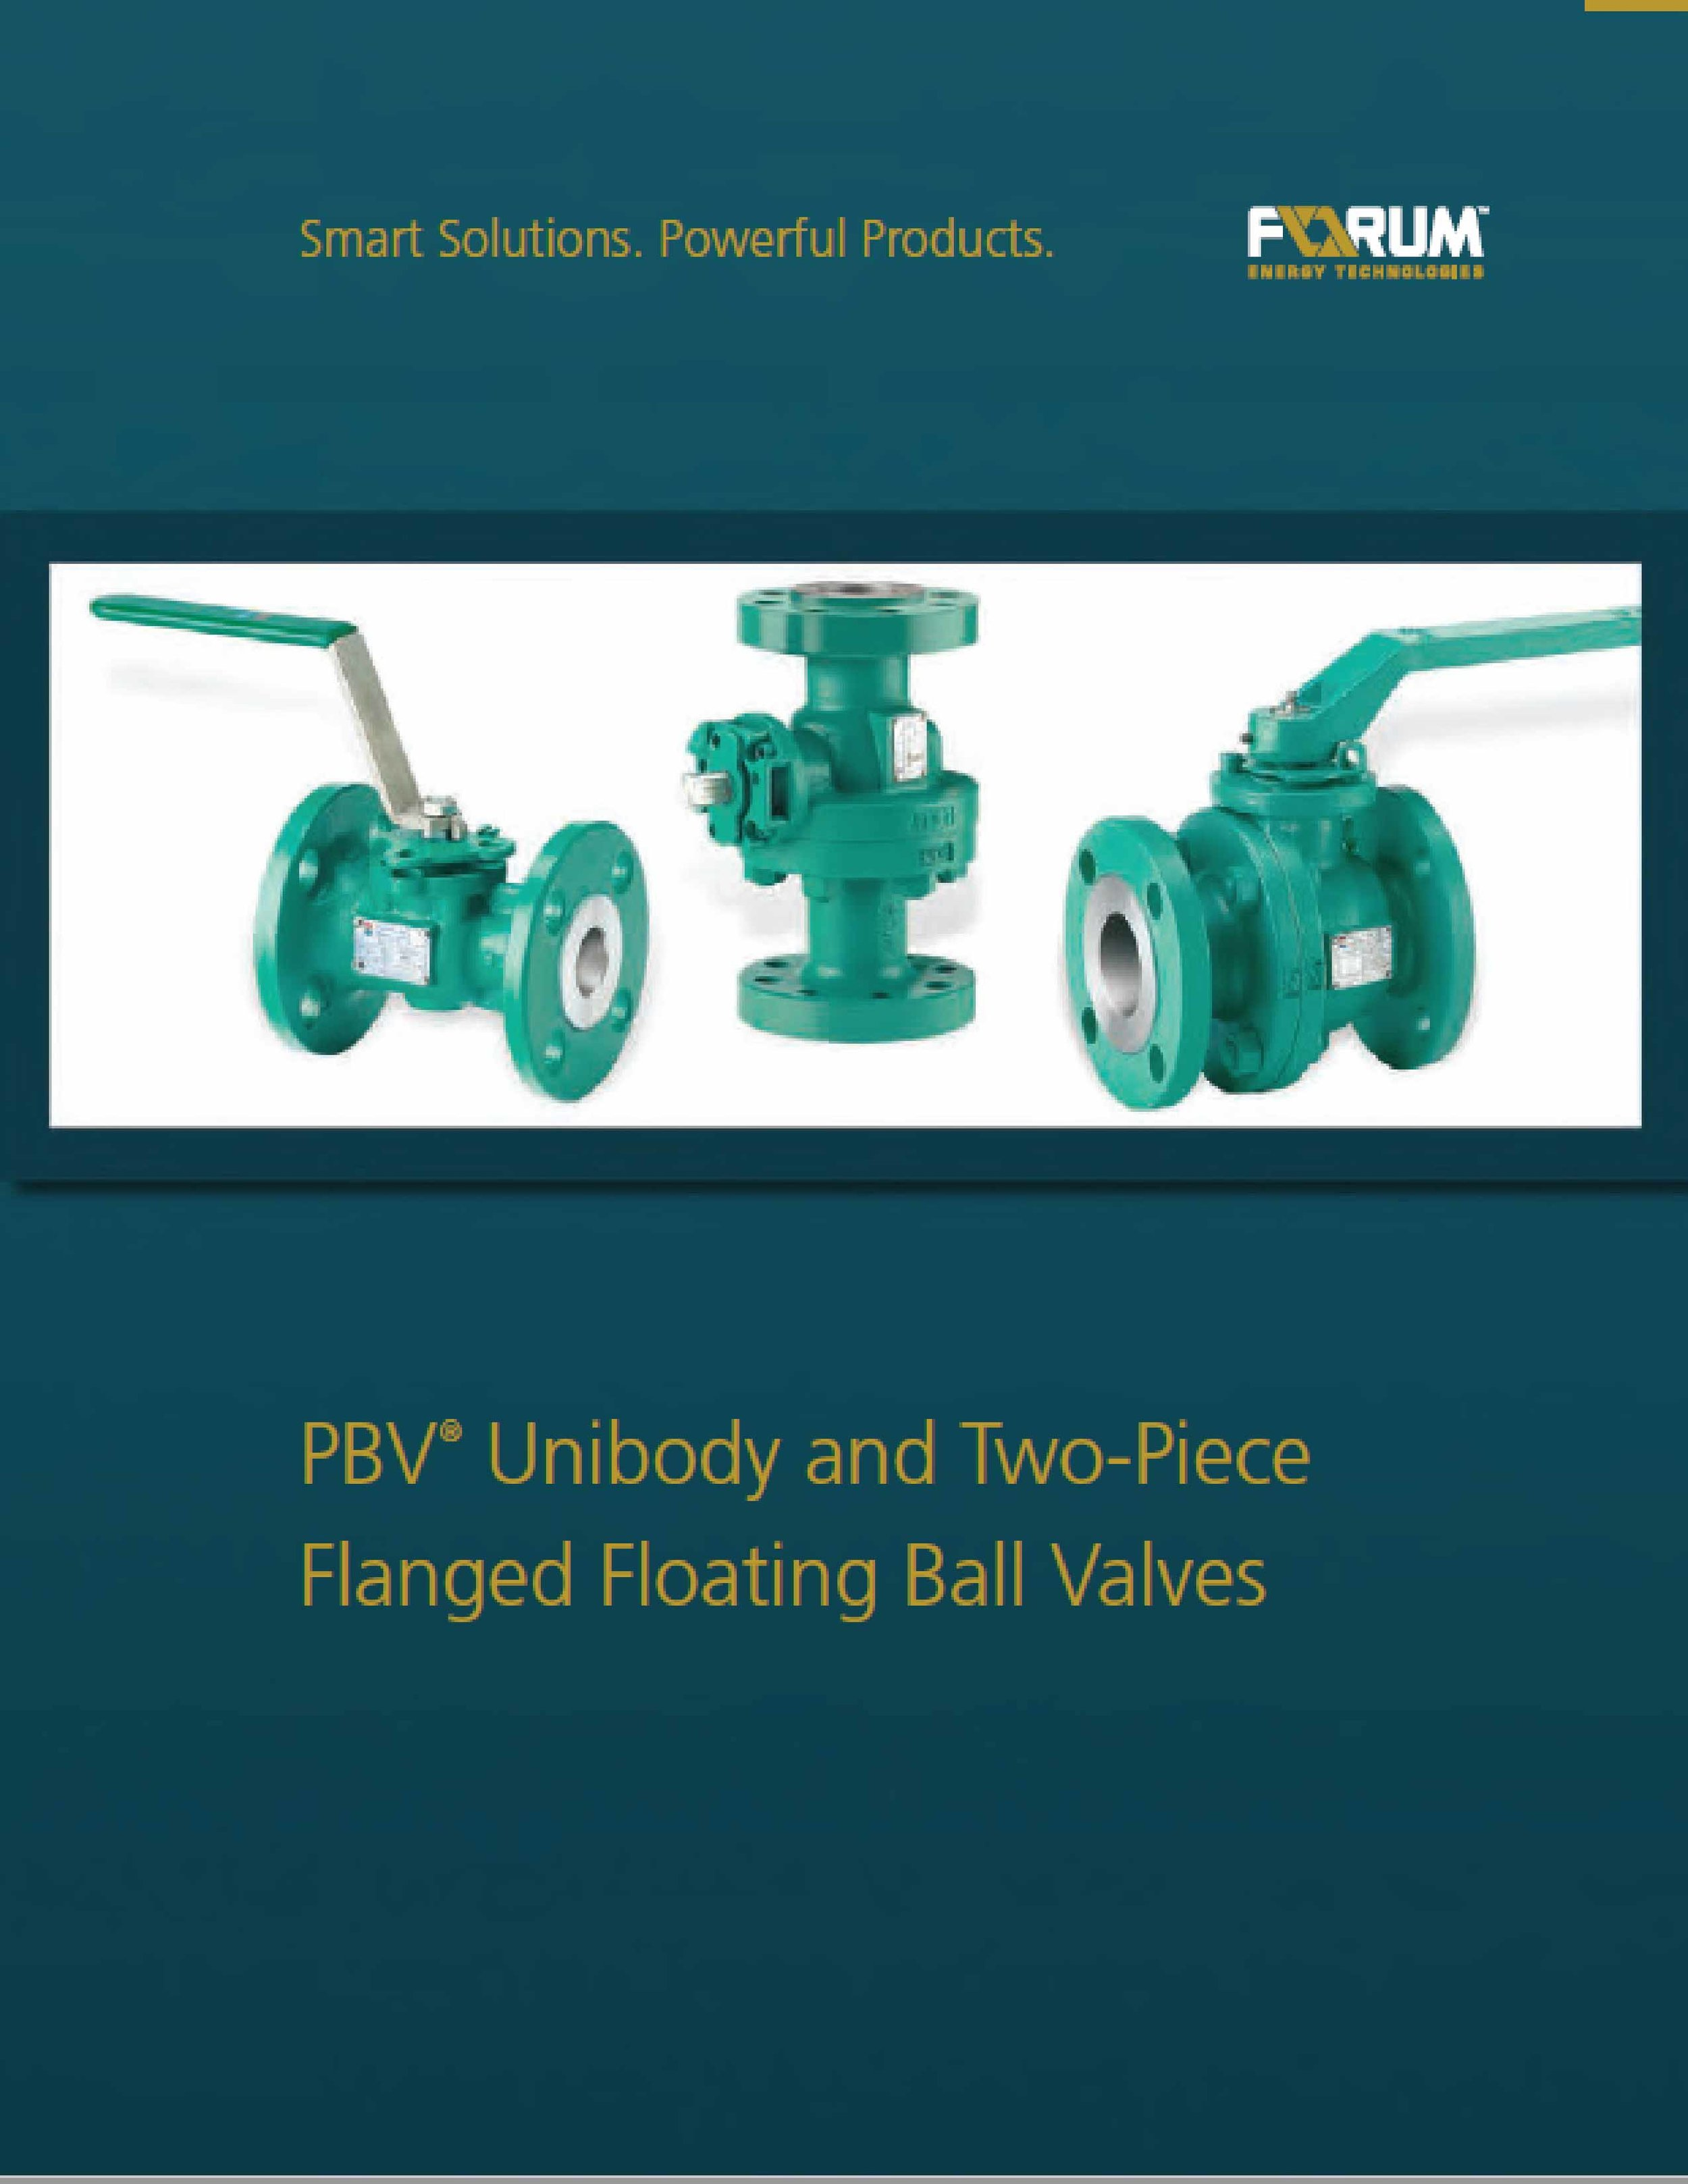 PBV_FB-brochure-01.jpg